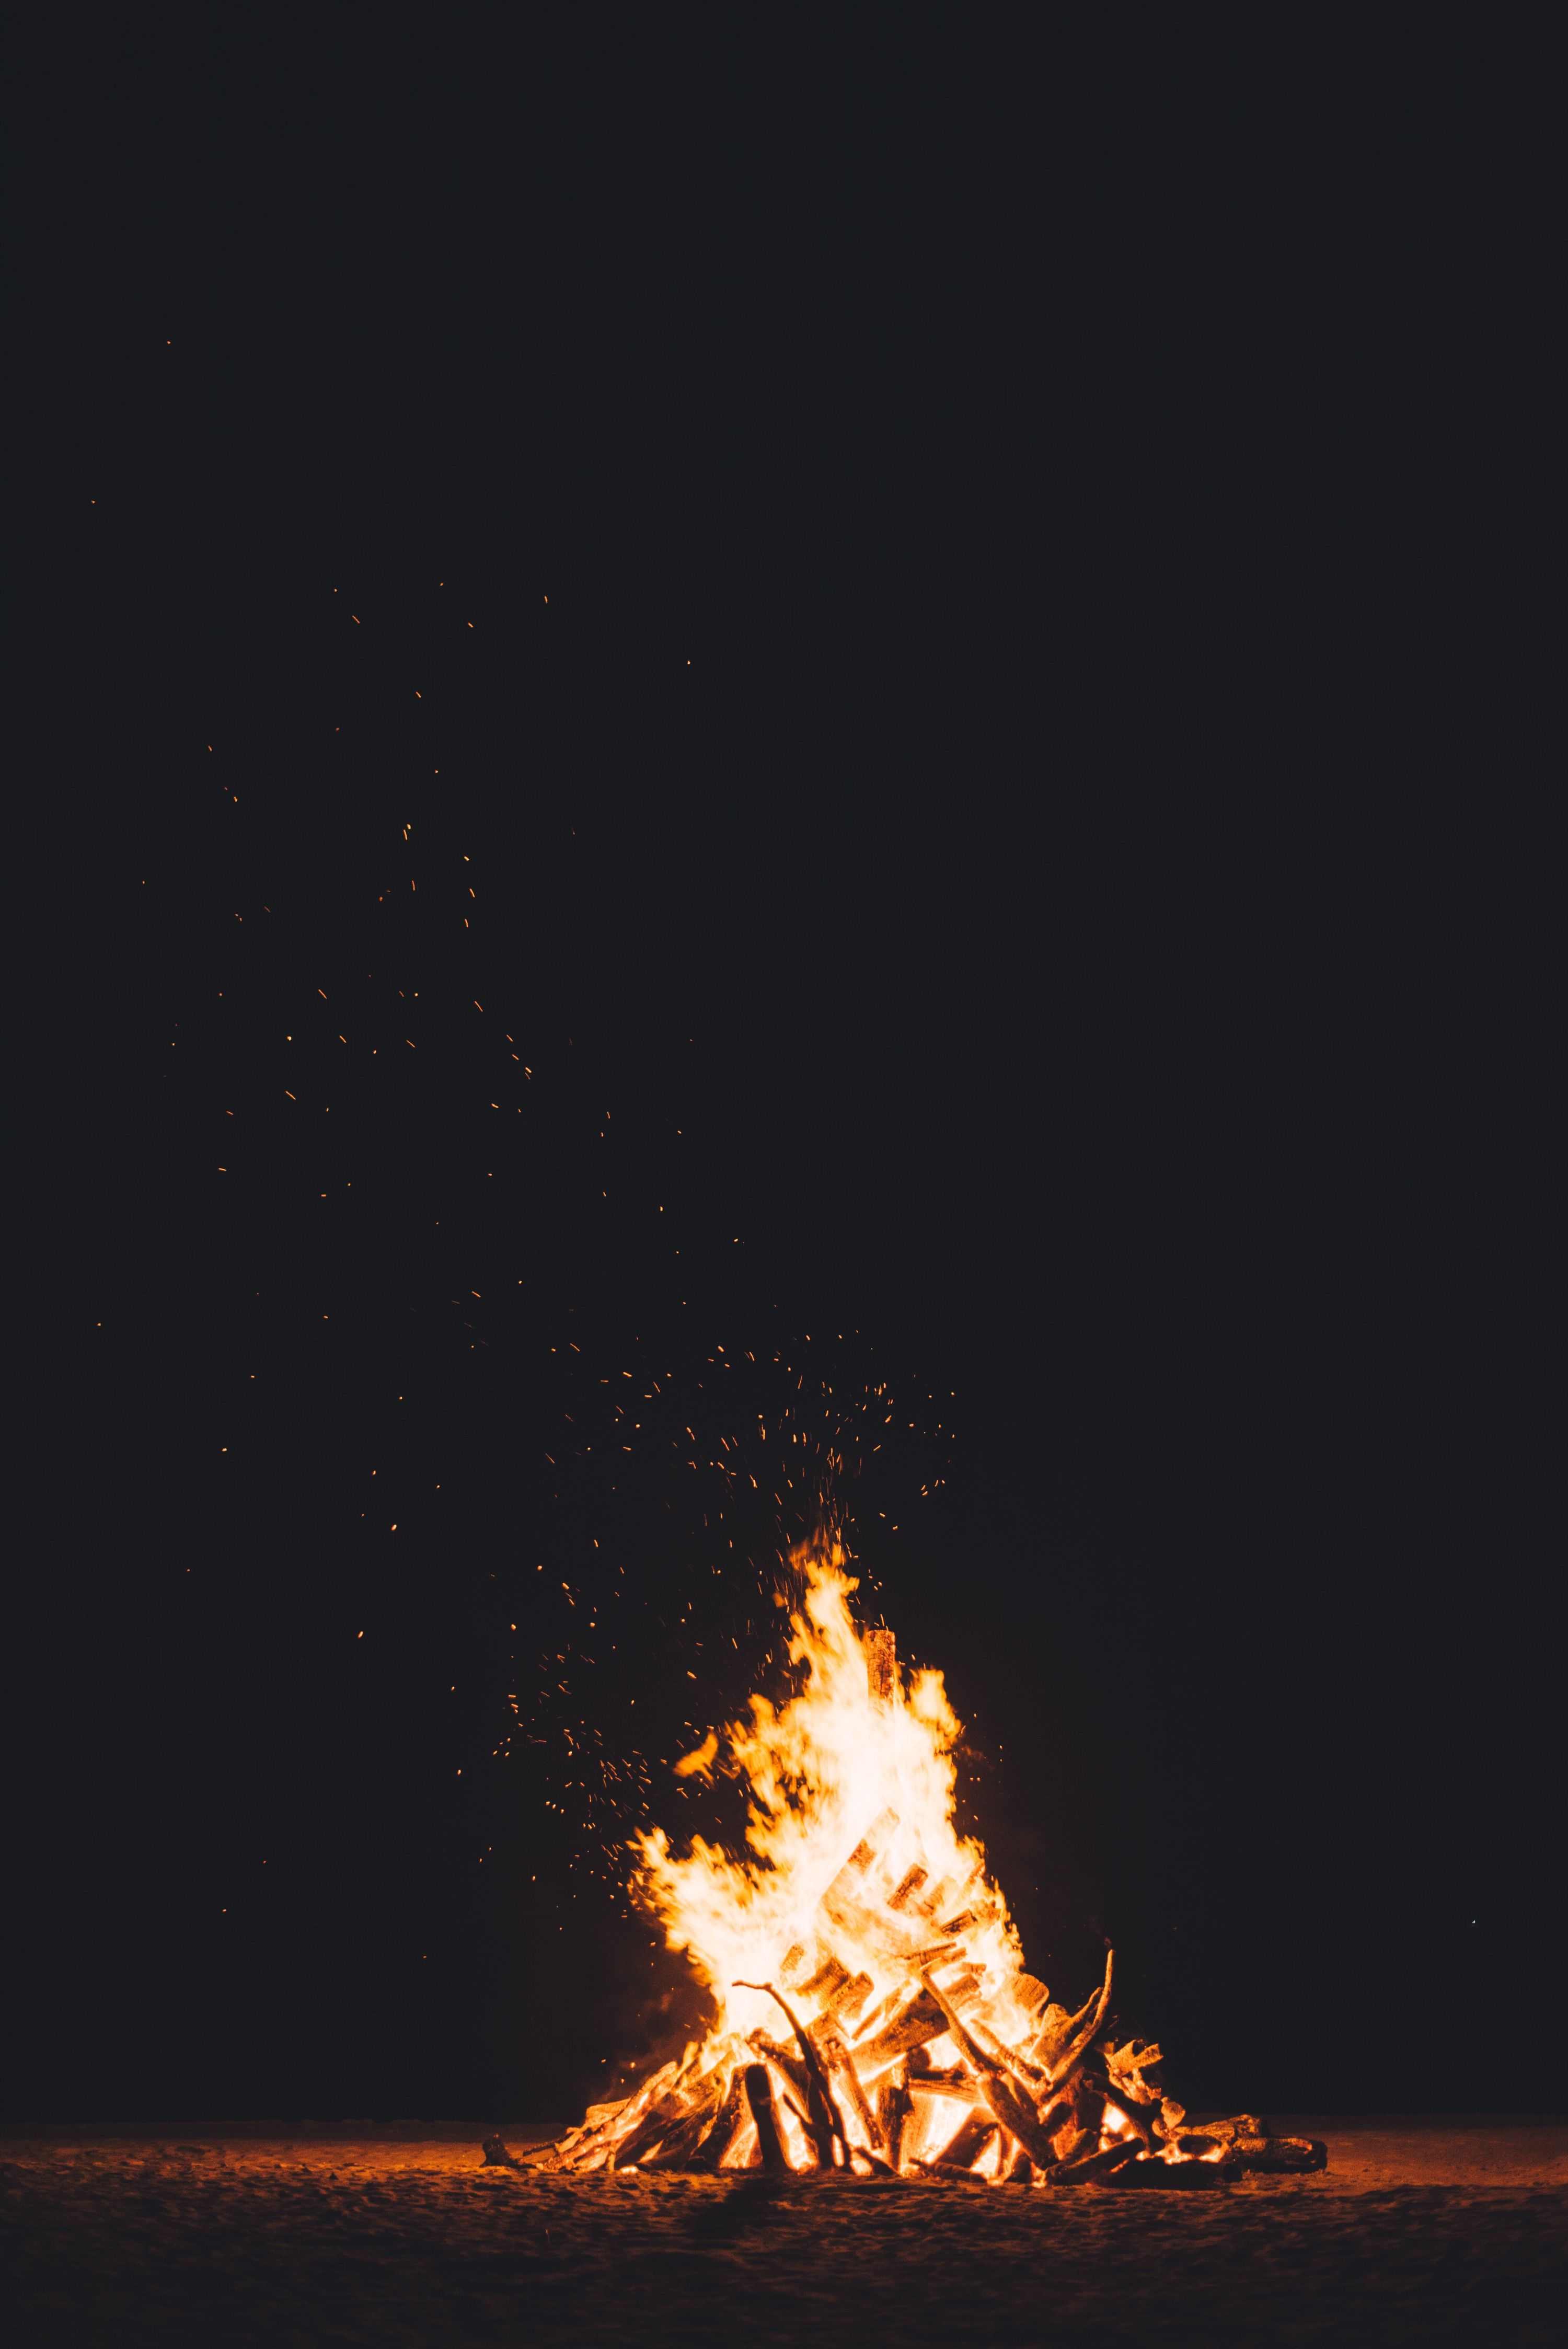 Photo By Chuttersnap Unsplash Fire Photography Fire Image Campfire